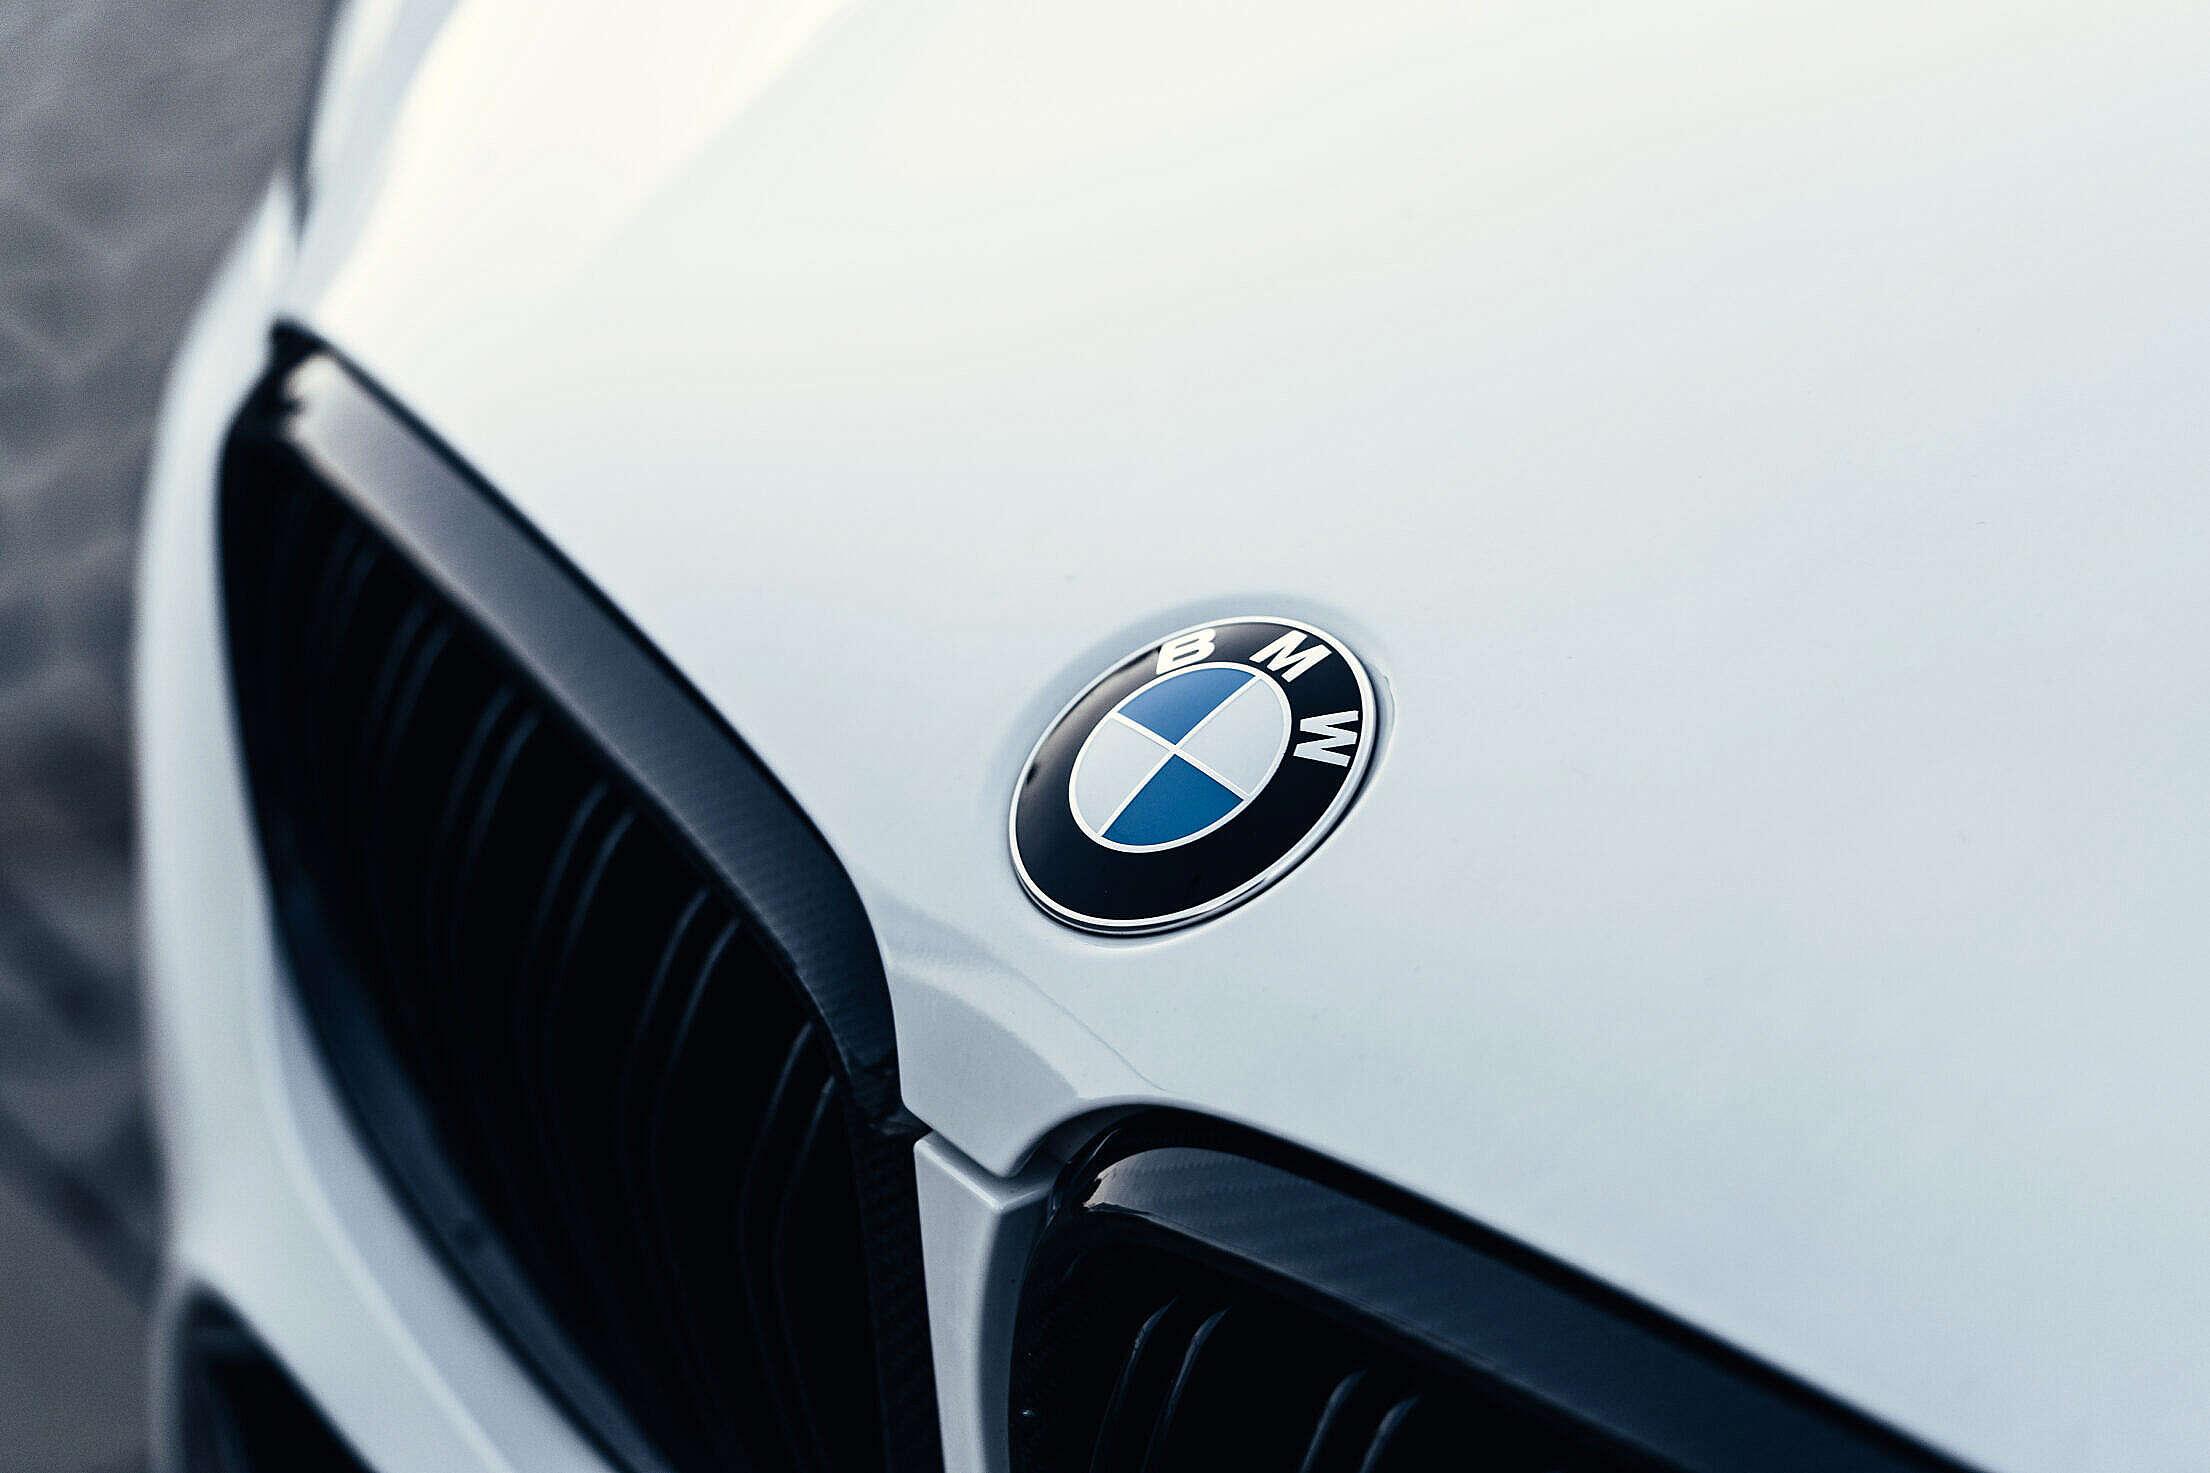 White Car Front Mask with BMW Logo Free Stock Photo